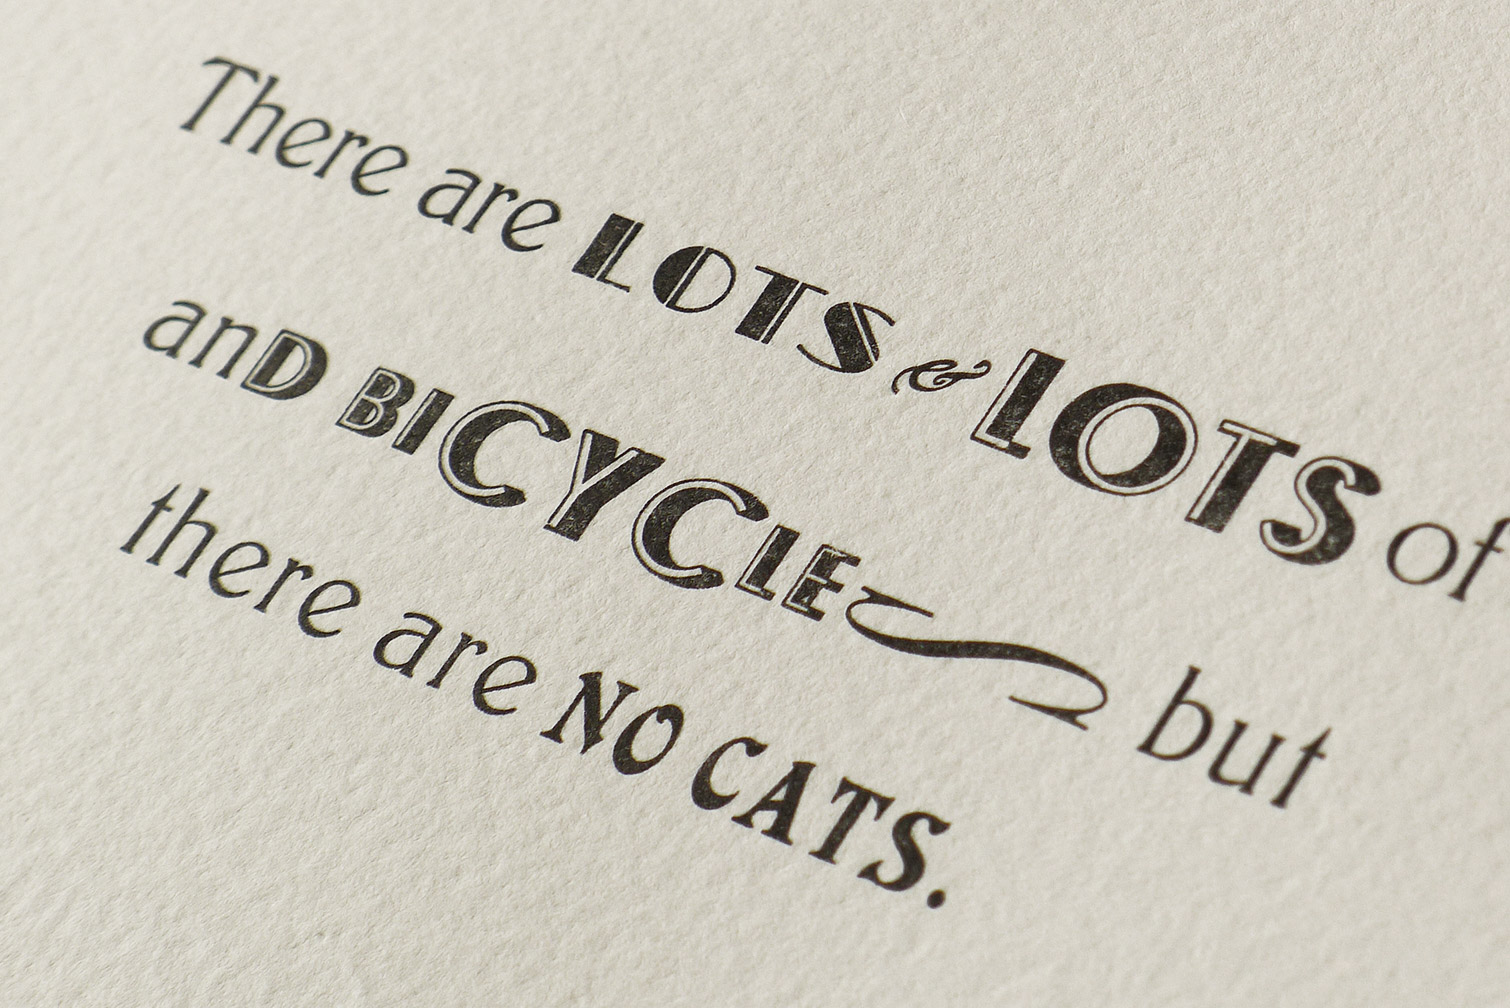 michael-caine-petropolis-joyce-cats-L1660600.jpg